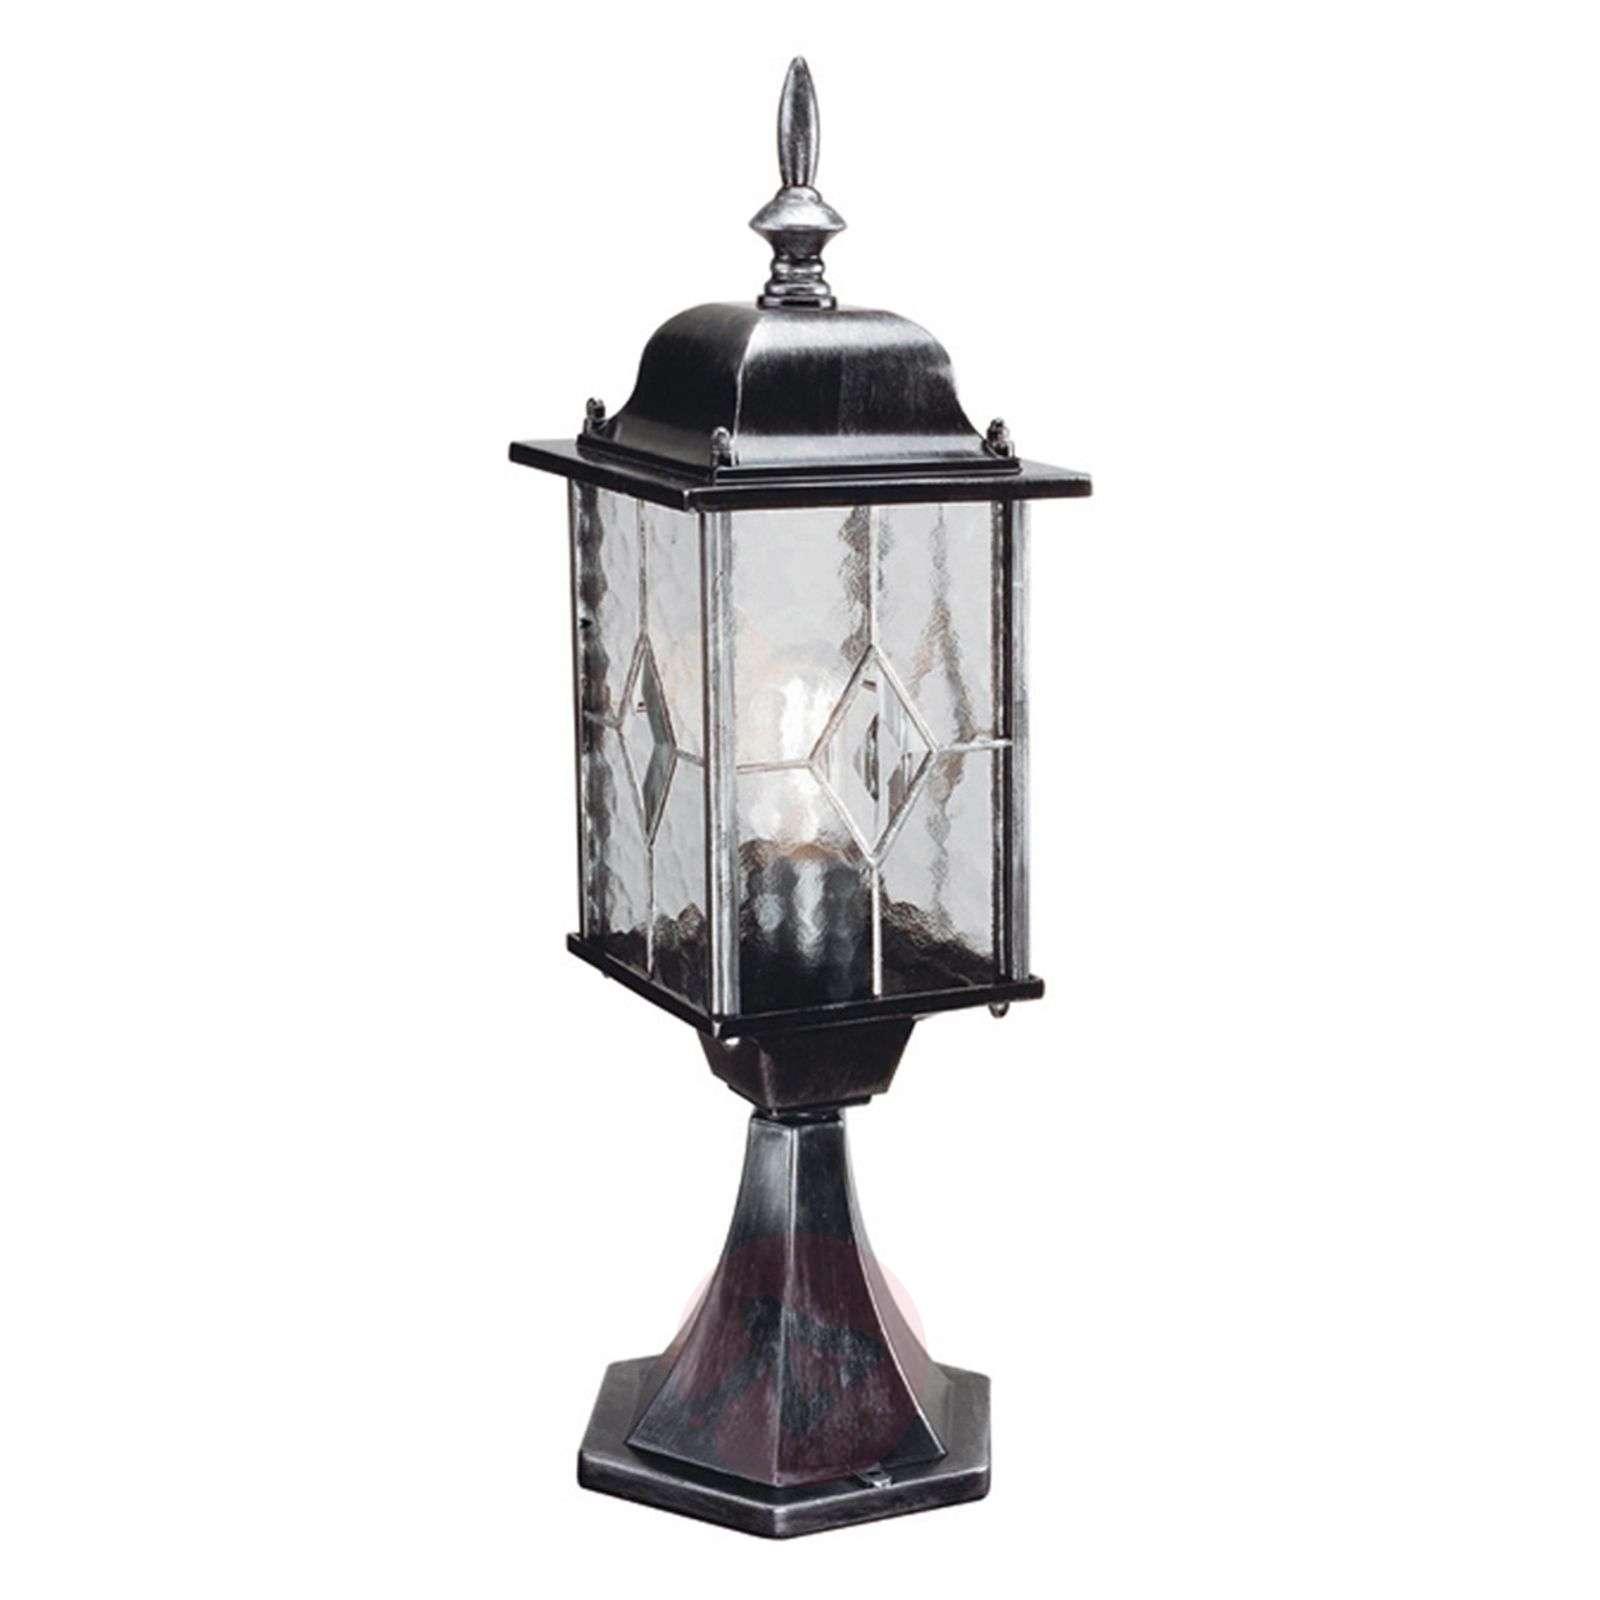 Wexford Pillar Light Robust-3048209-01